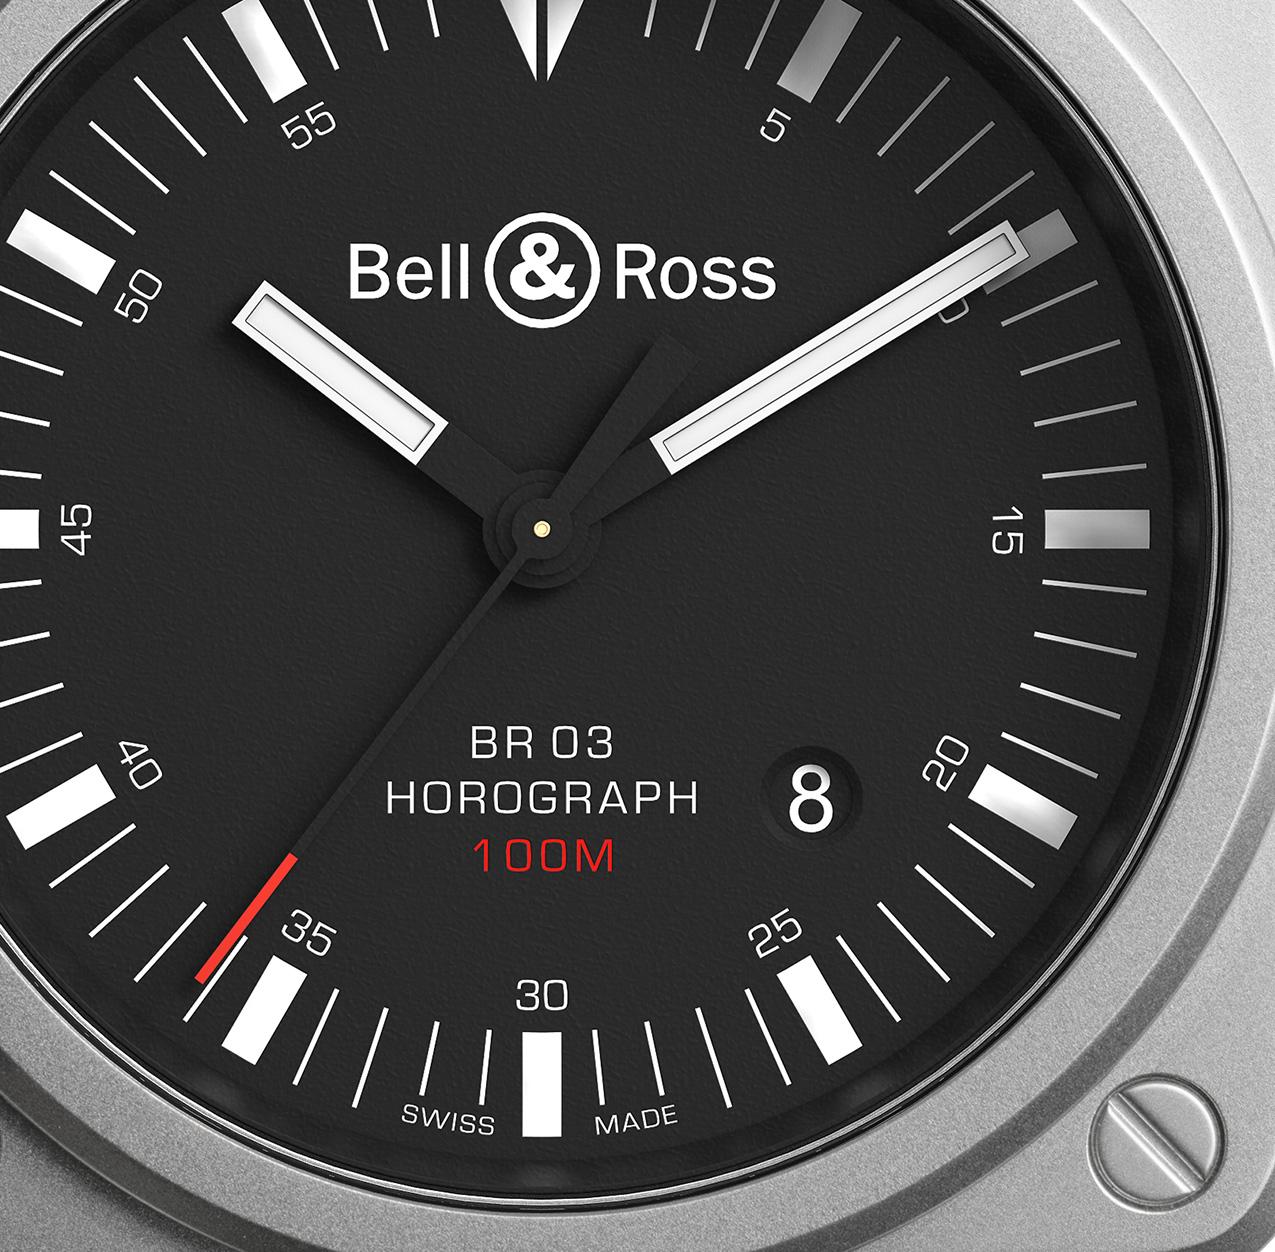 br03-horograph-focus